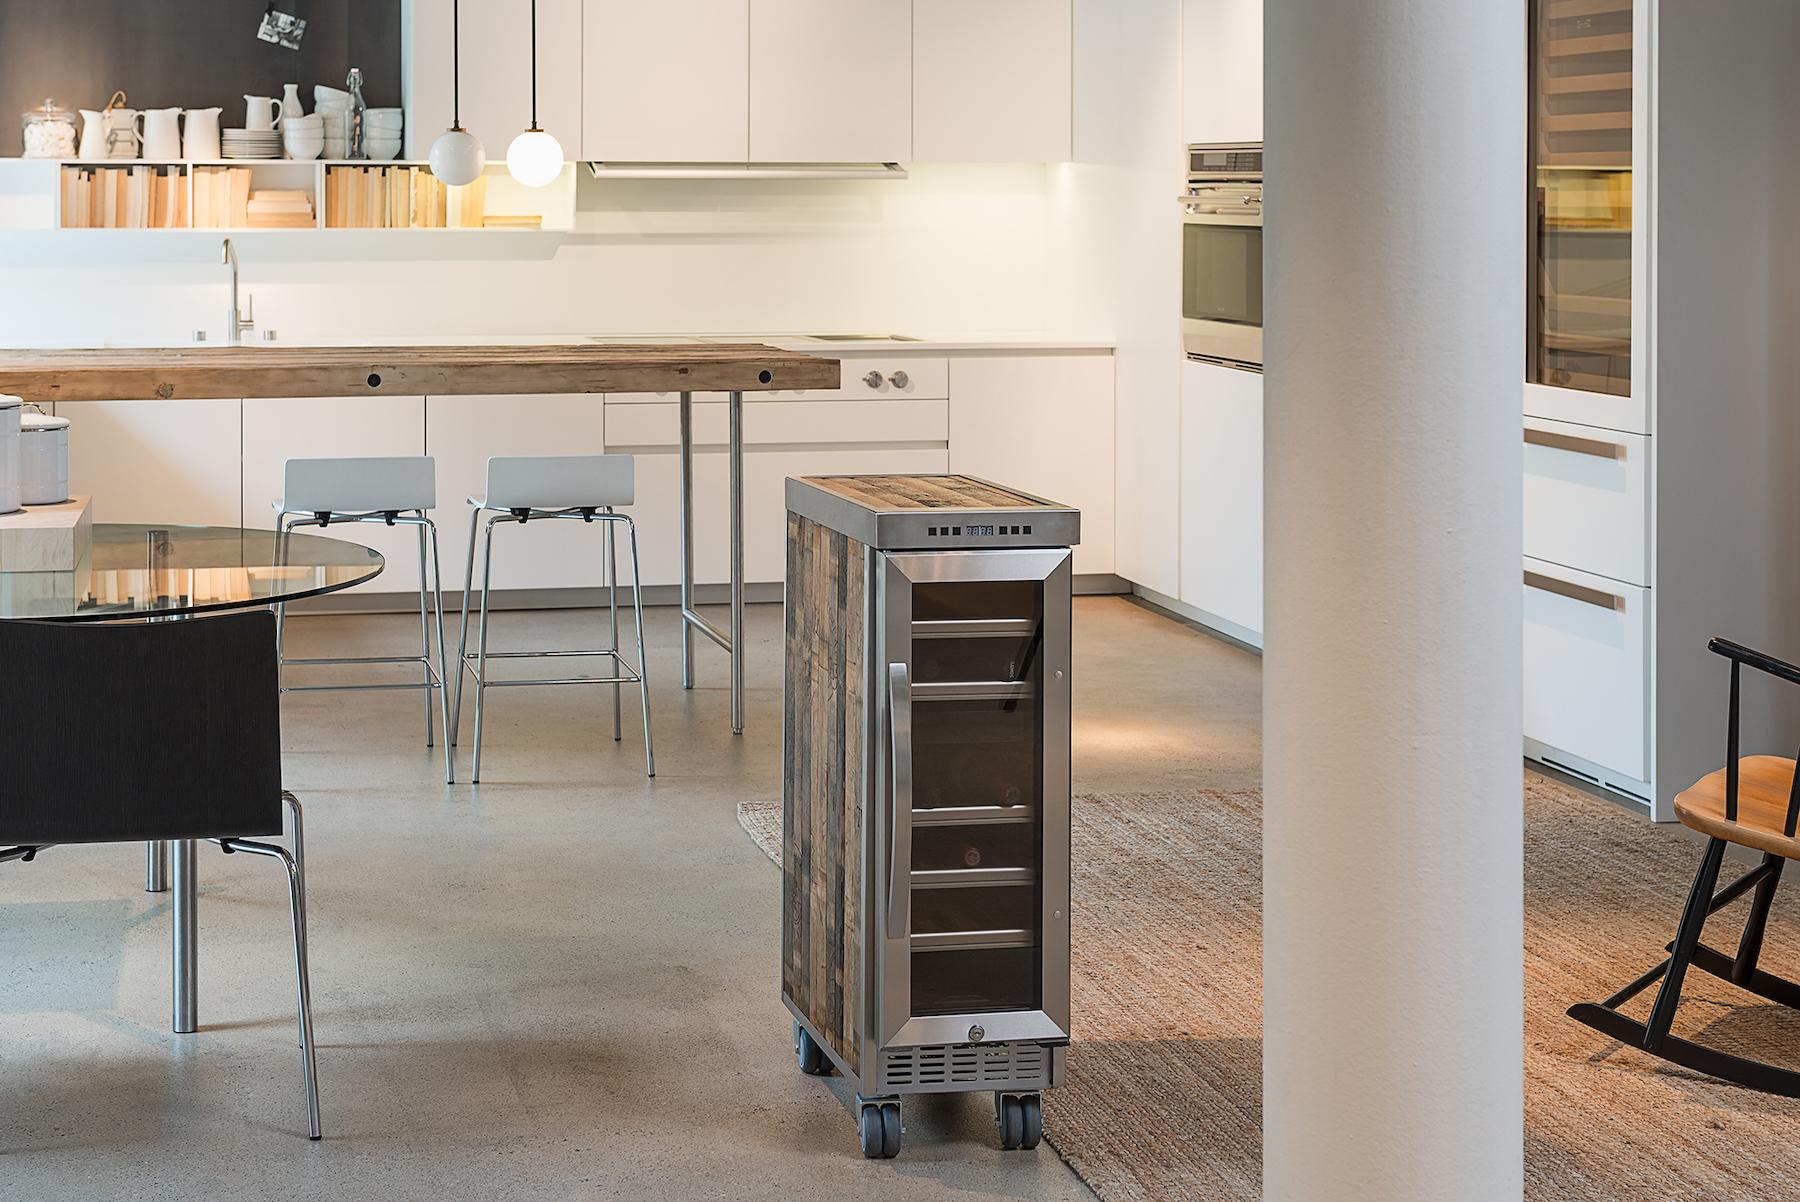 Skypak_Trolley-Cooler-Kitchen-Design